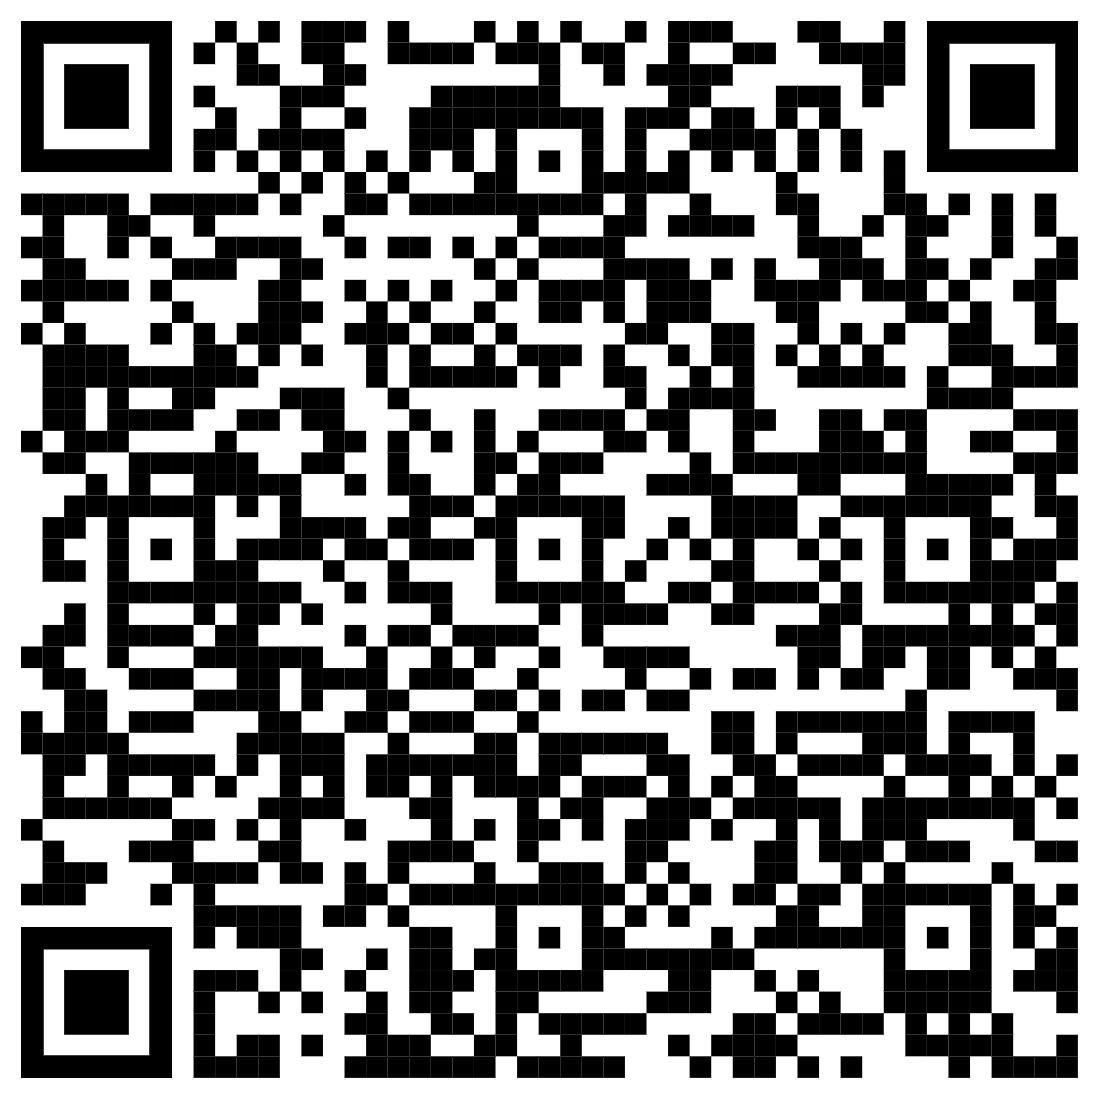 QR code Adresse bansard